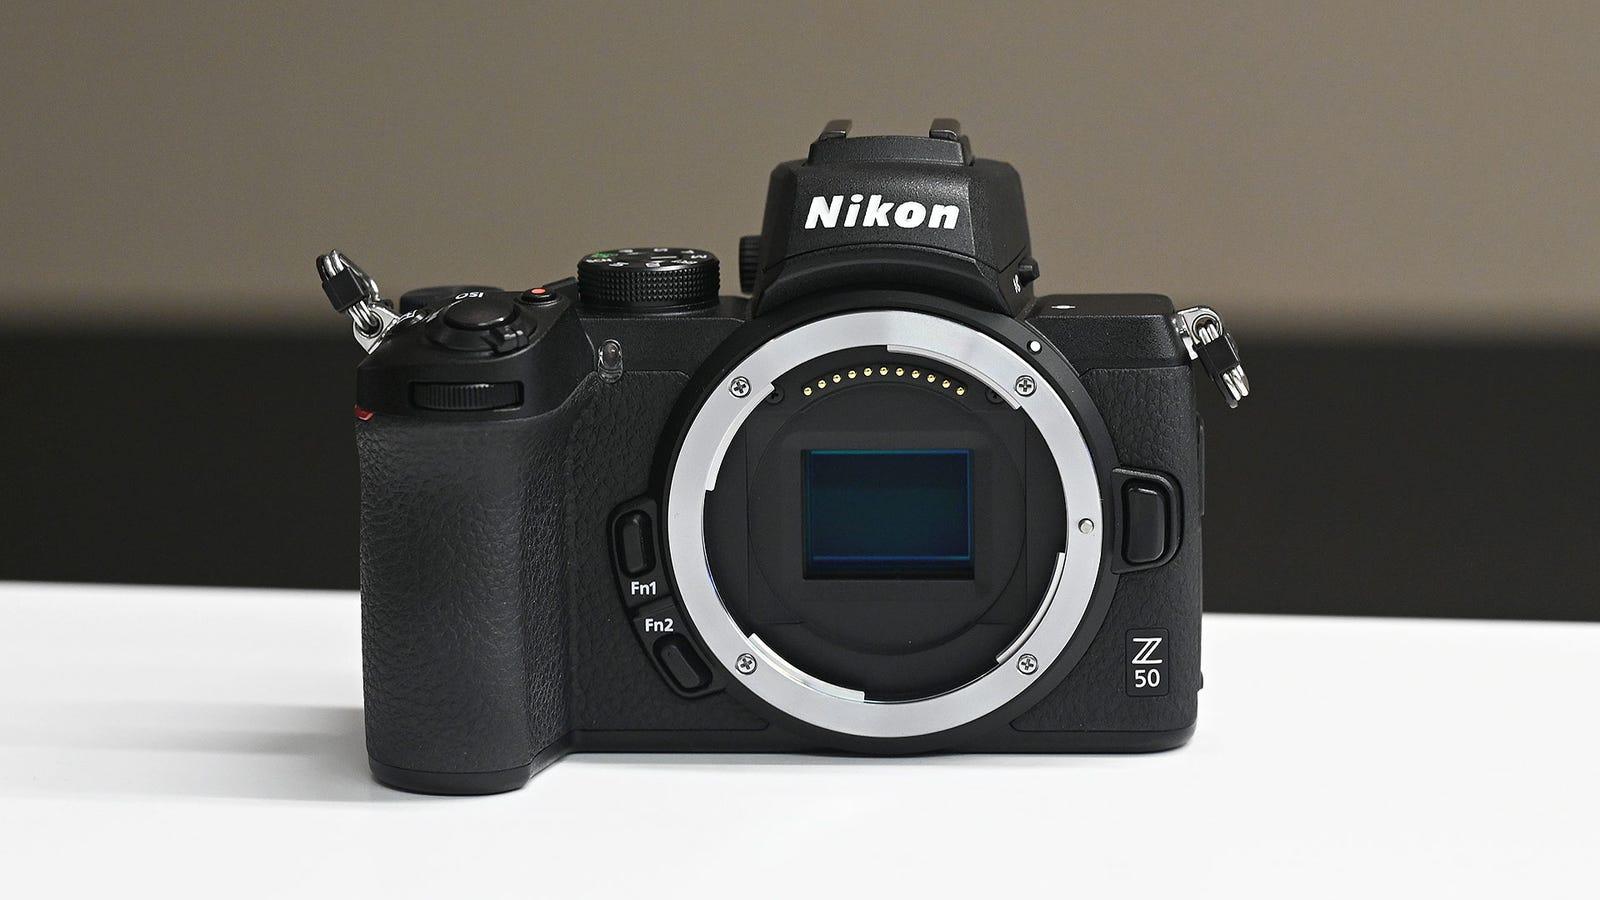 Unlike the Nikon Z6/Z7, the Z50 features a smaller 20.9-MP DX-sized sensor.